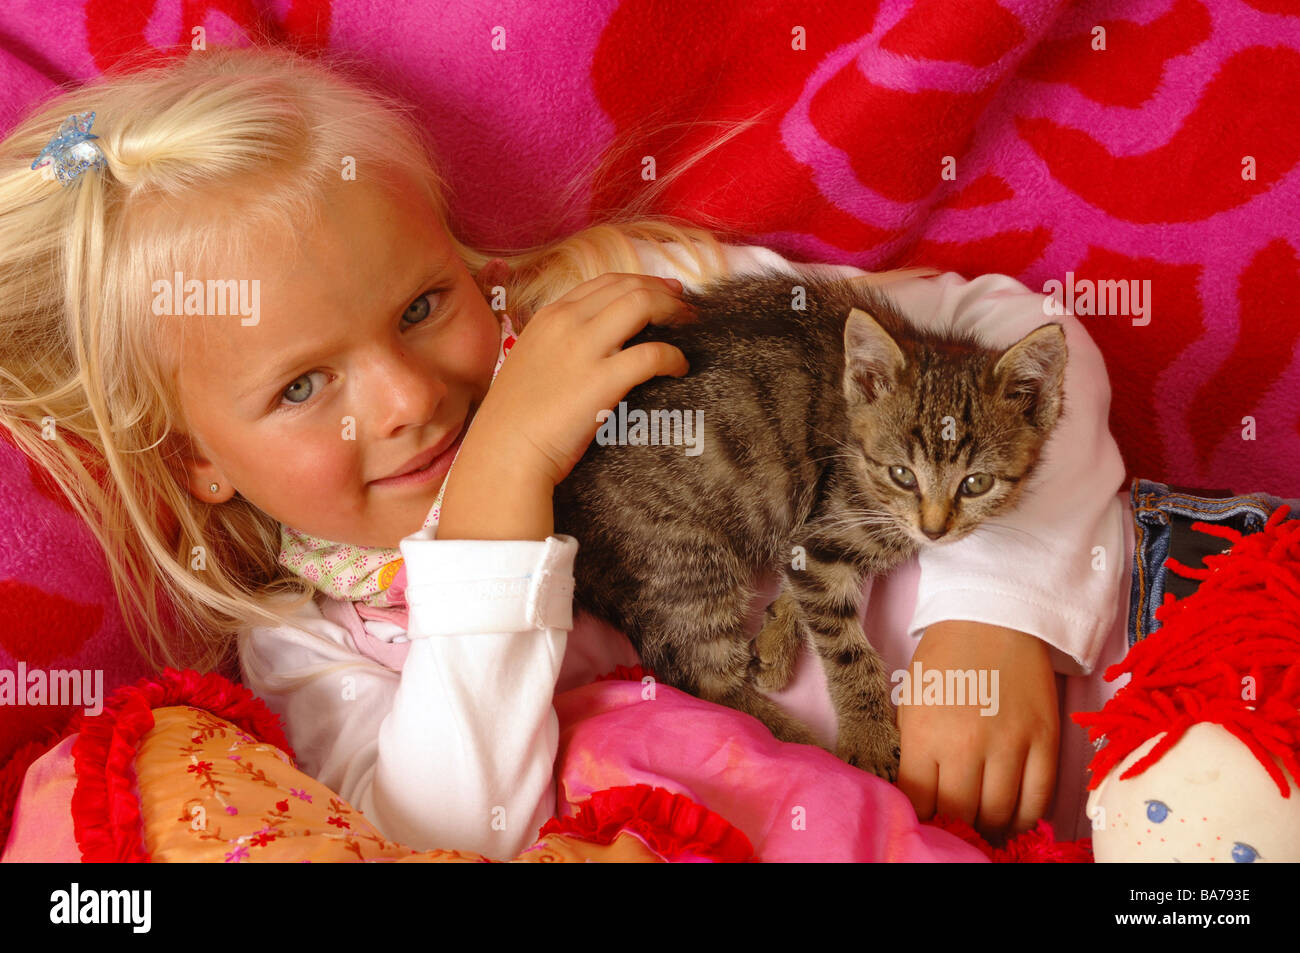 Girls smiles kittens doll cuddle lies portrait series people 5 years child-portrait child toddler blond gaze camera childhood Stock Photo